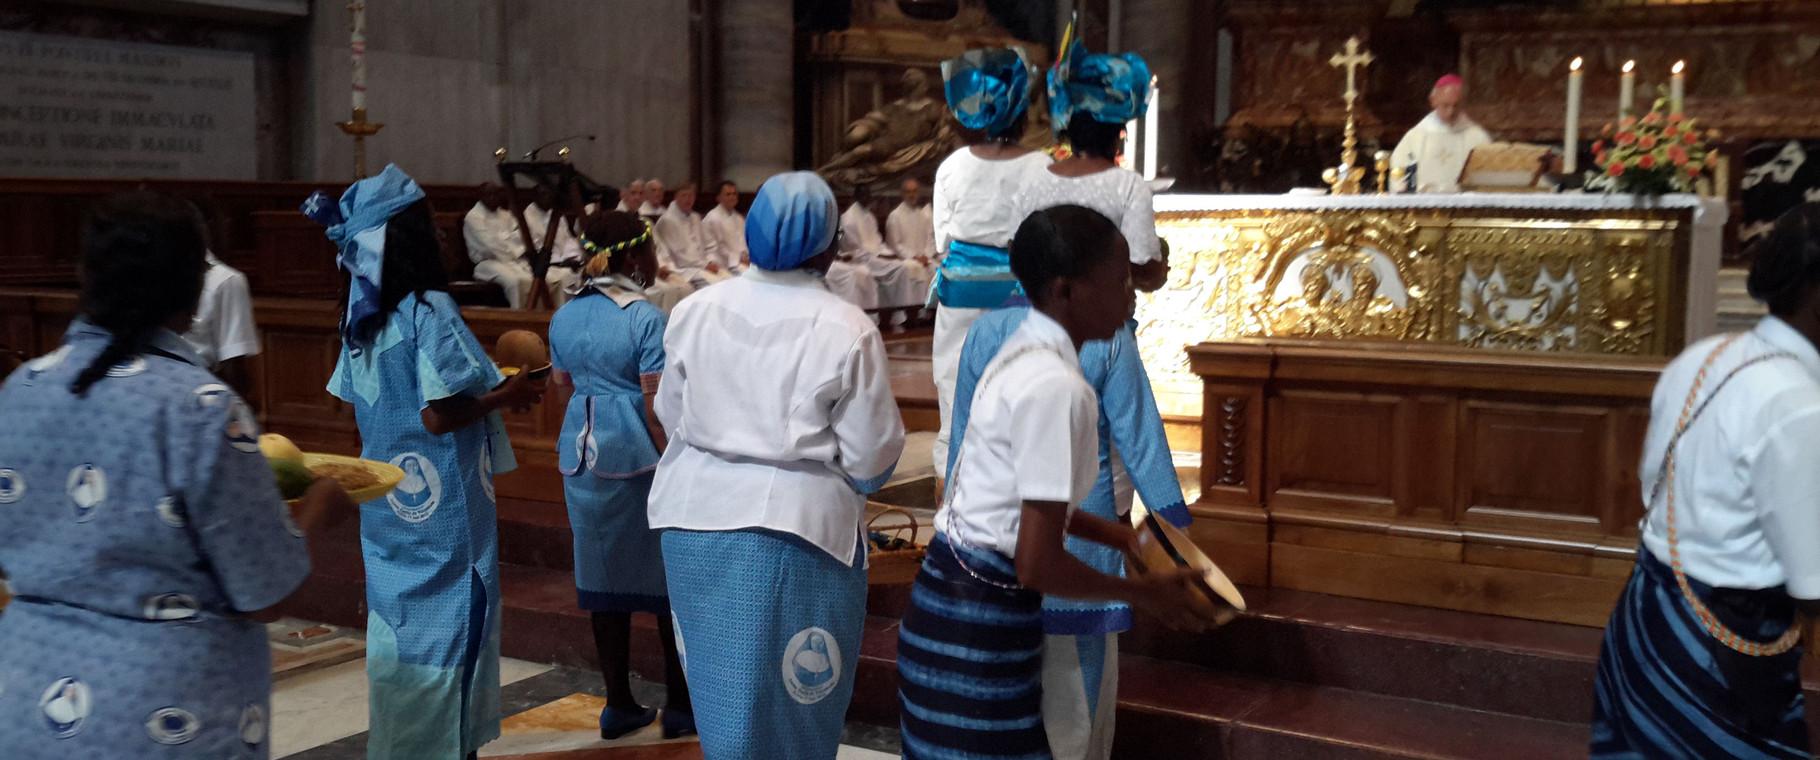 Vaticano: Messe - Ofertorio